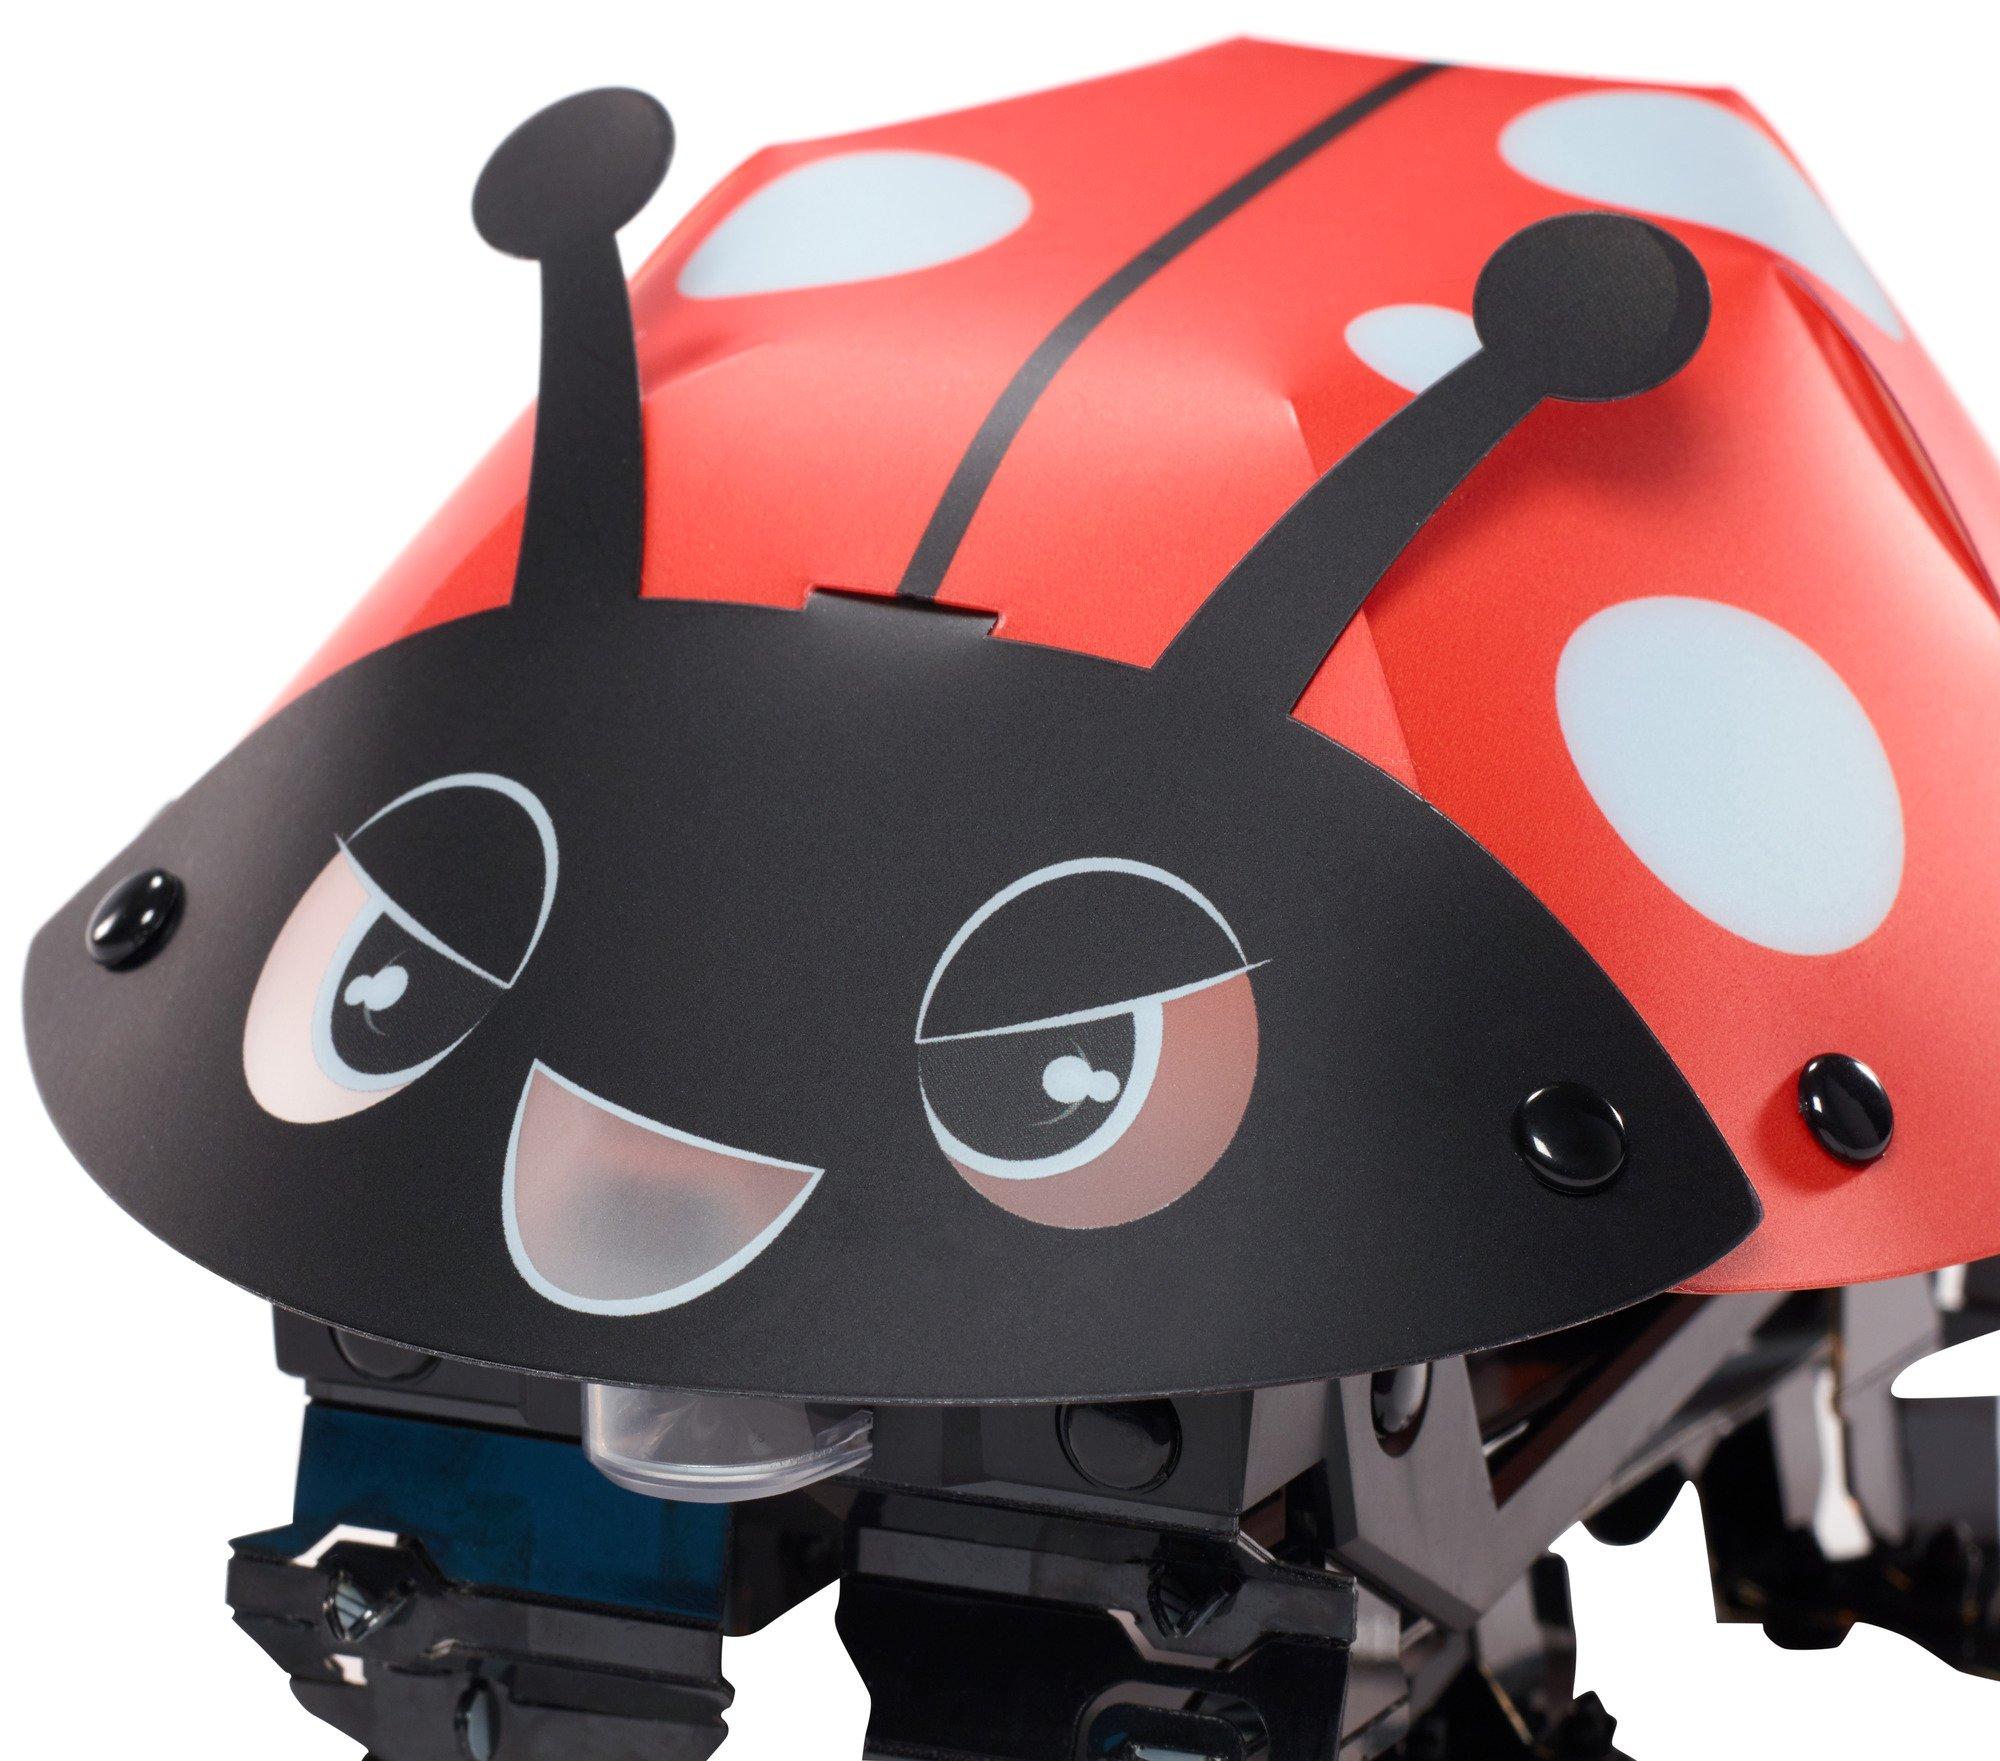 Kamigami Lina Robot by Mattel (Image #2)